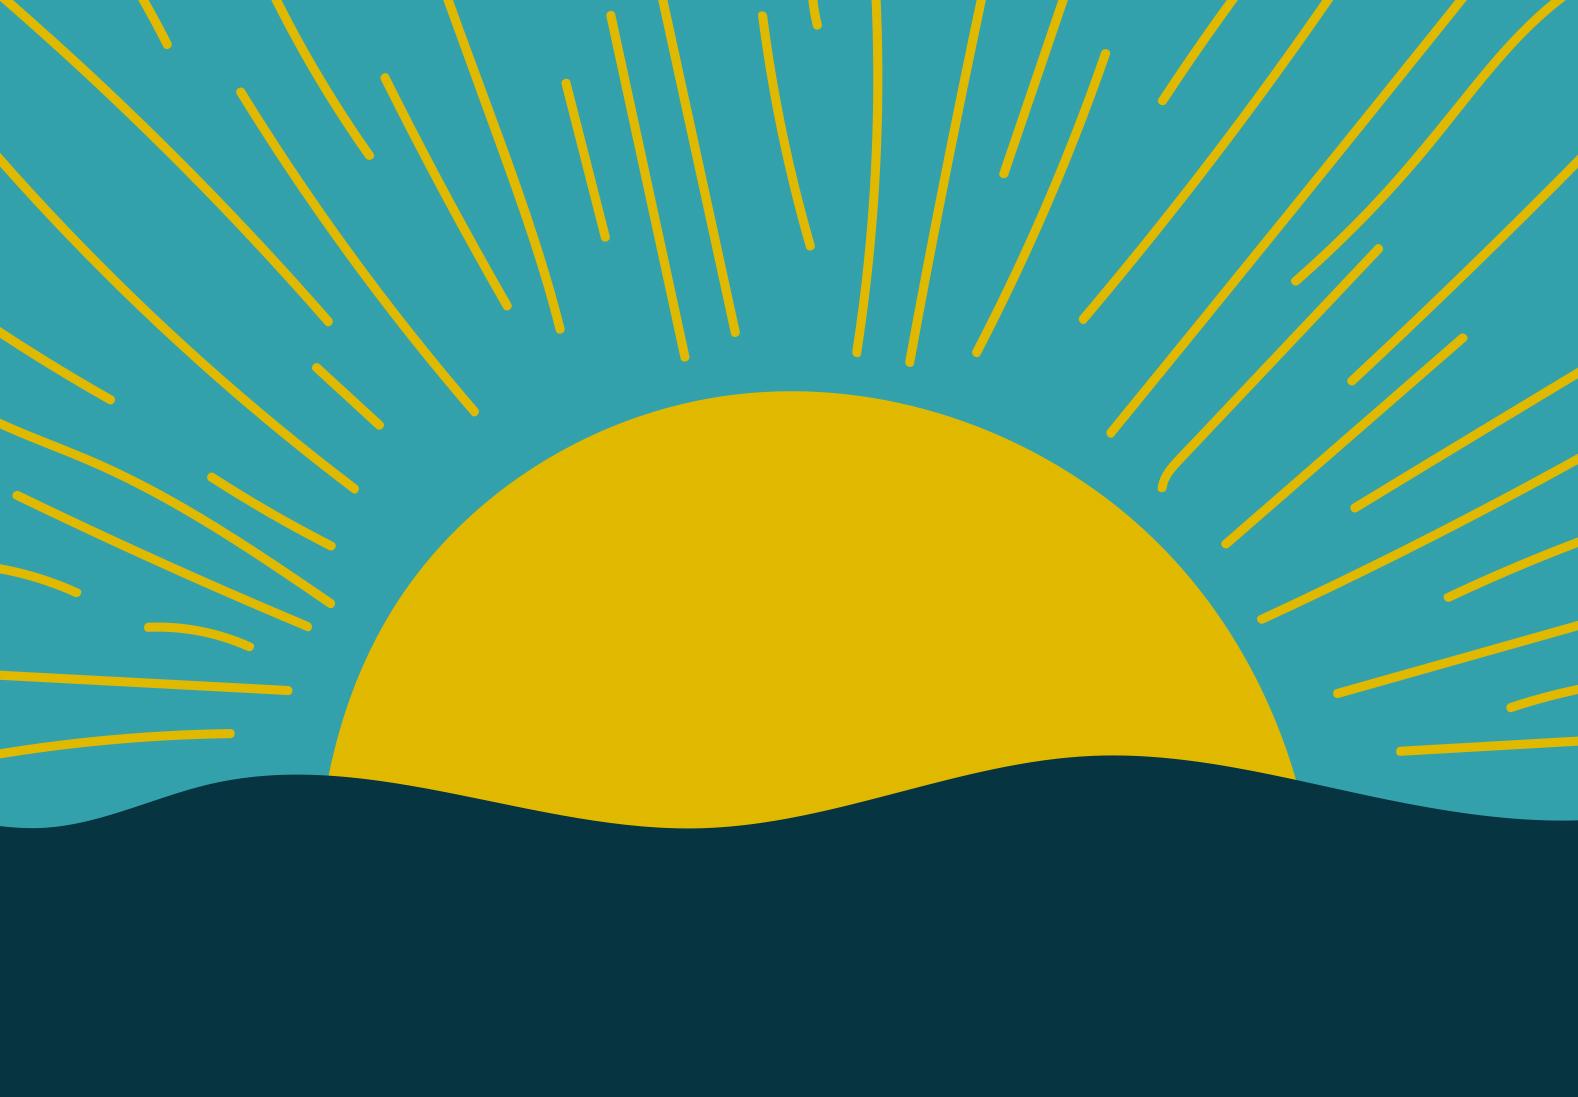 75. sunrises and sunsets  (anna-sophia p)